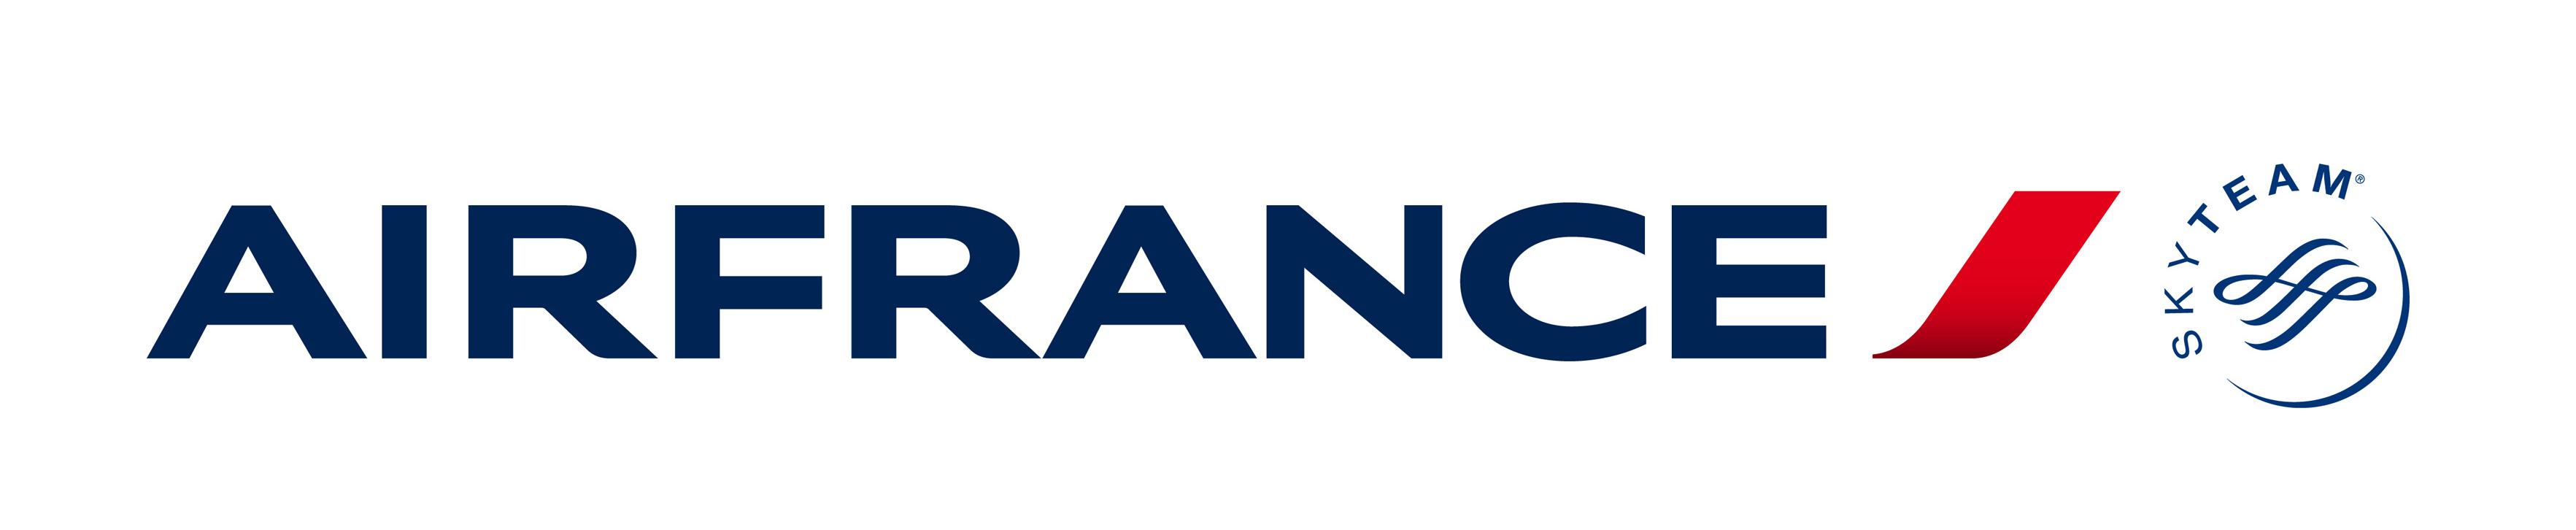 Logo Air France Klm PNG - 111256